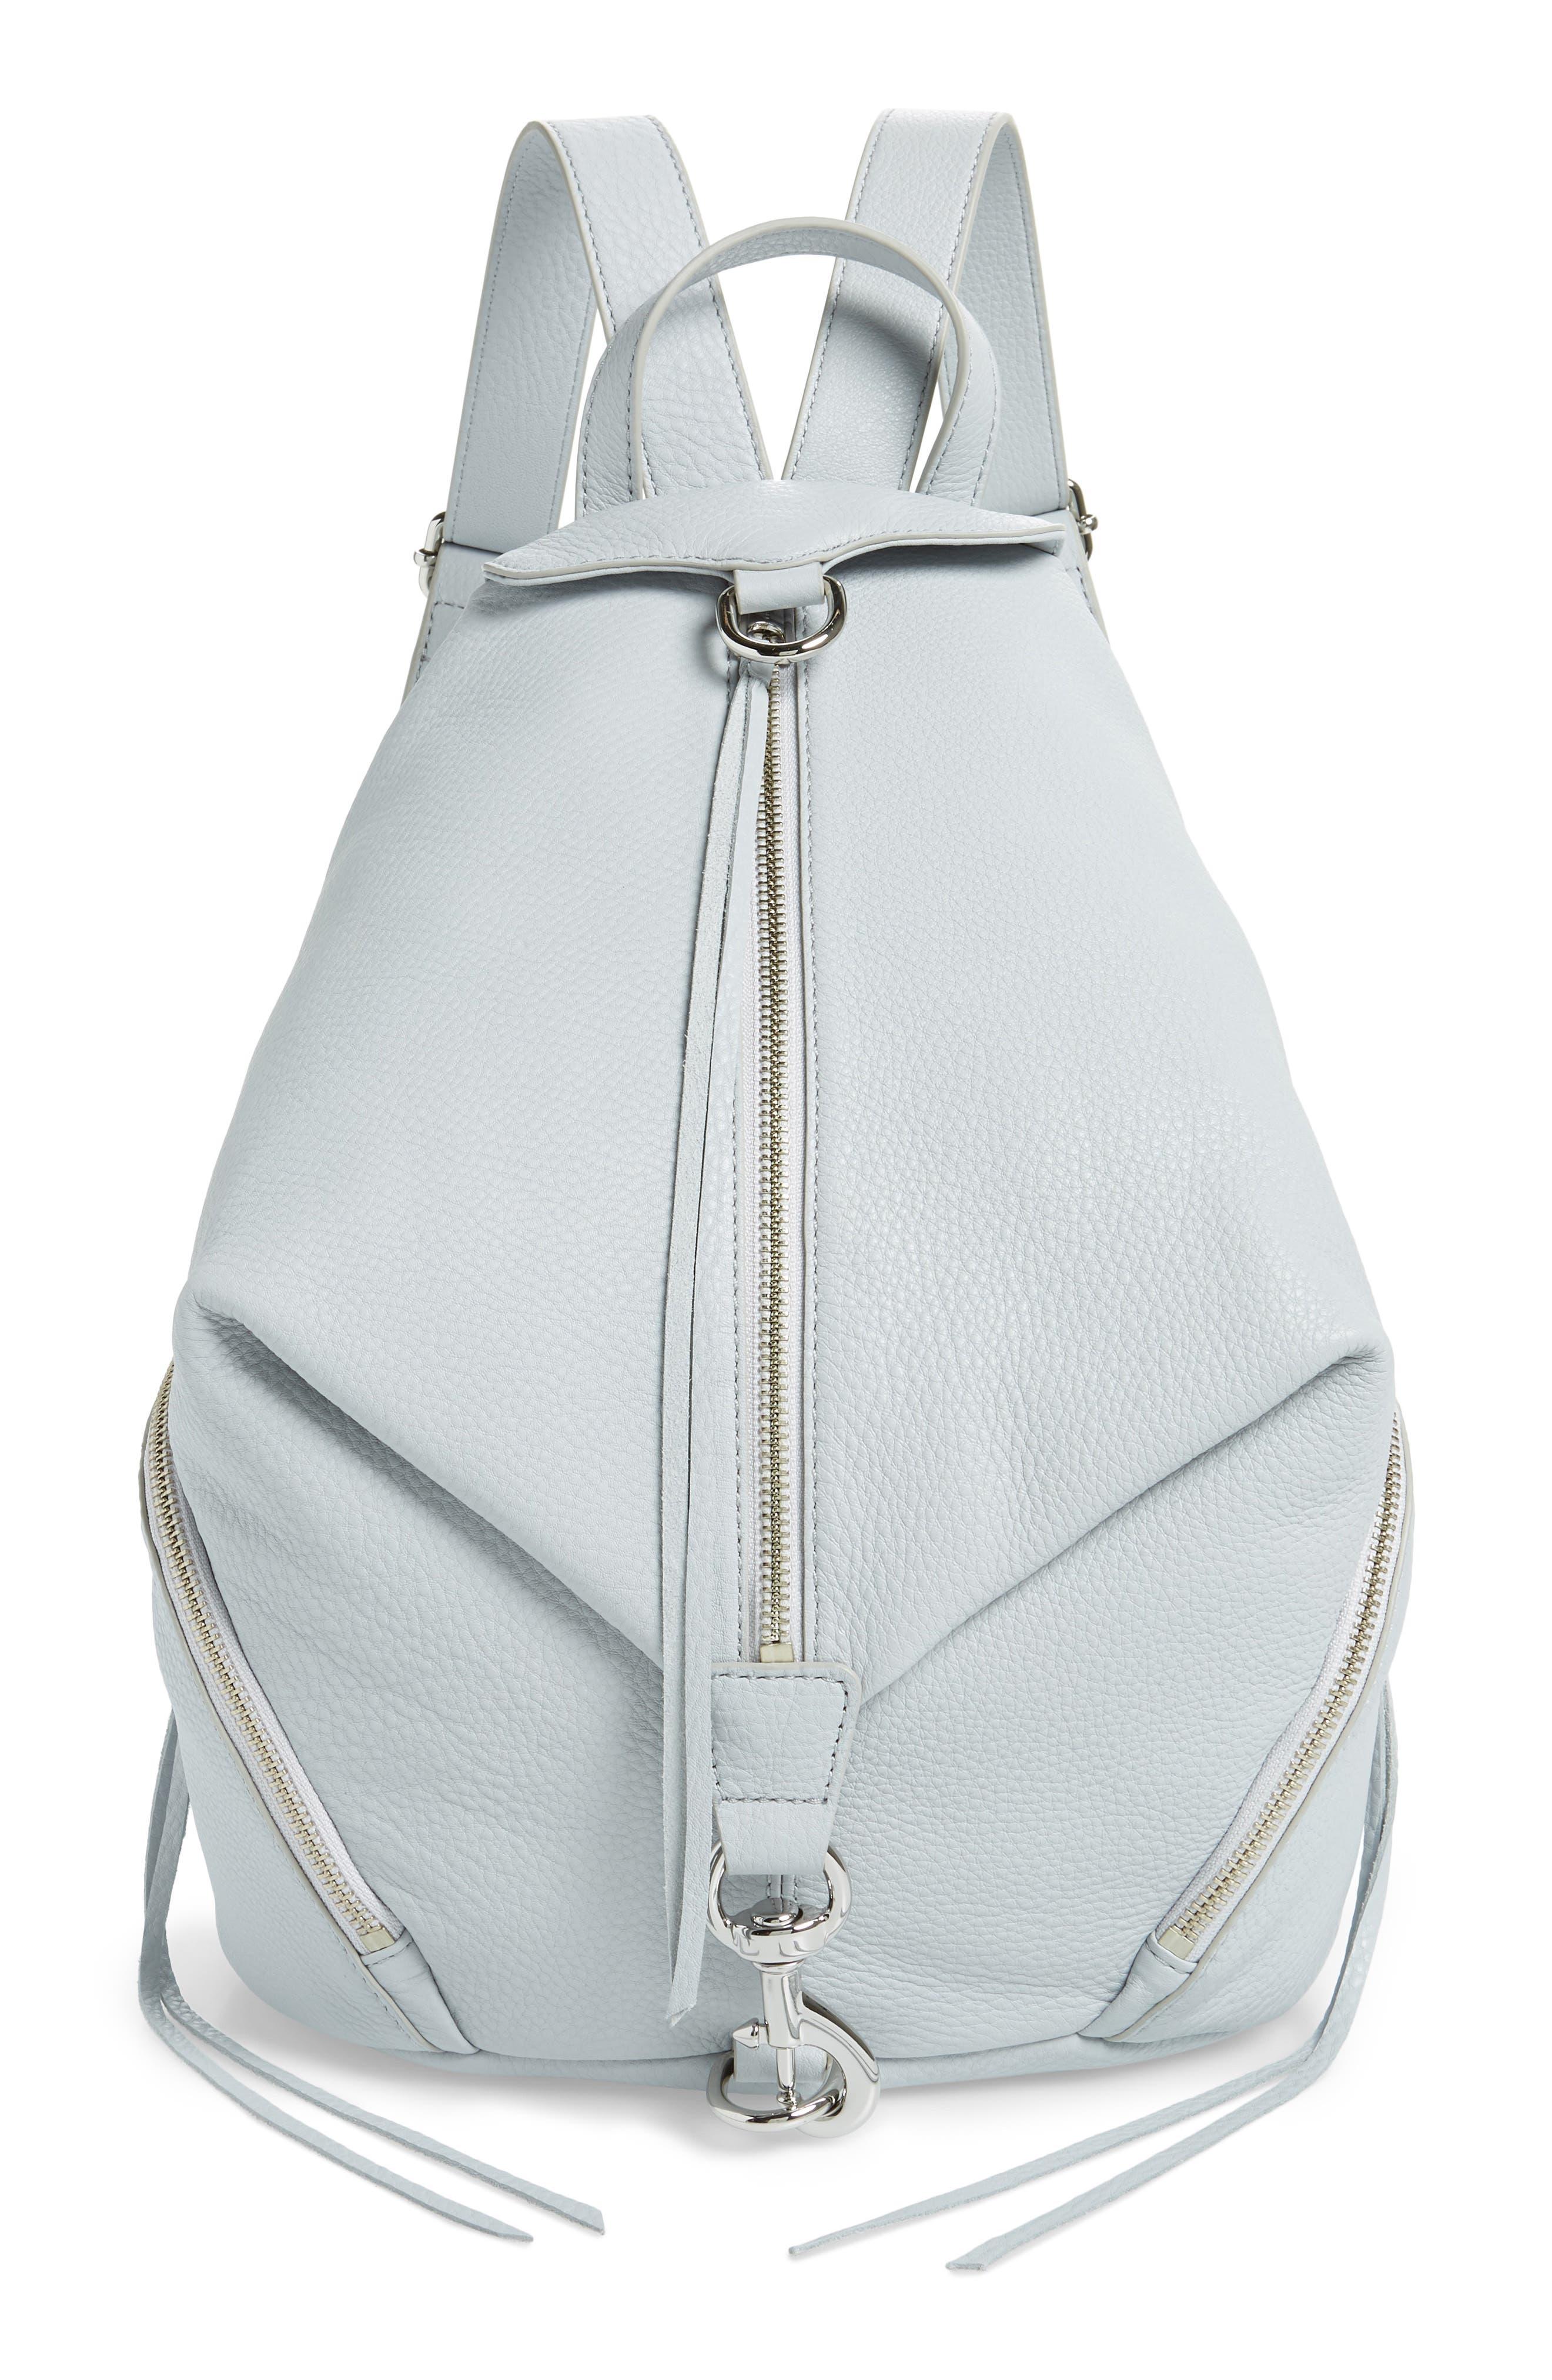 Rebecca Minkoff Handbags ae0047952afba